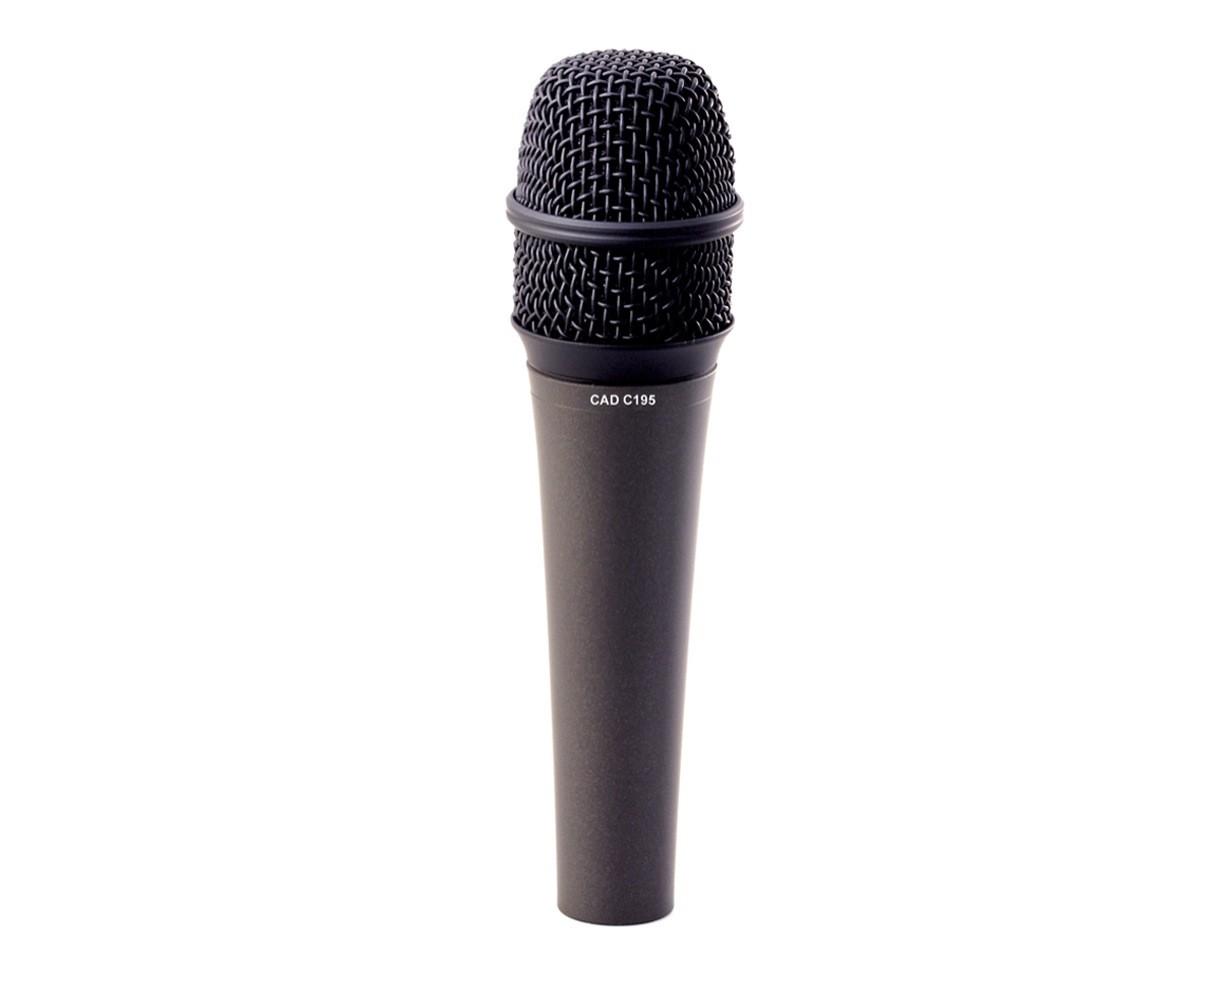 CAD C195 Cardioid Condenser Microphone